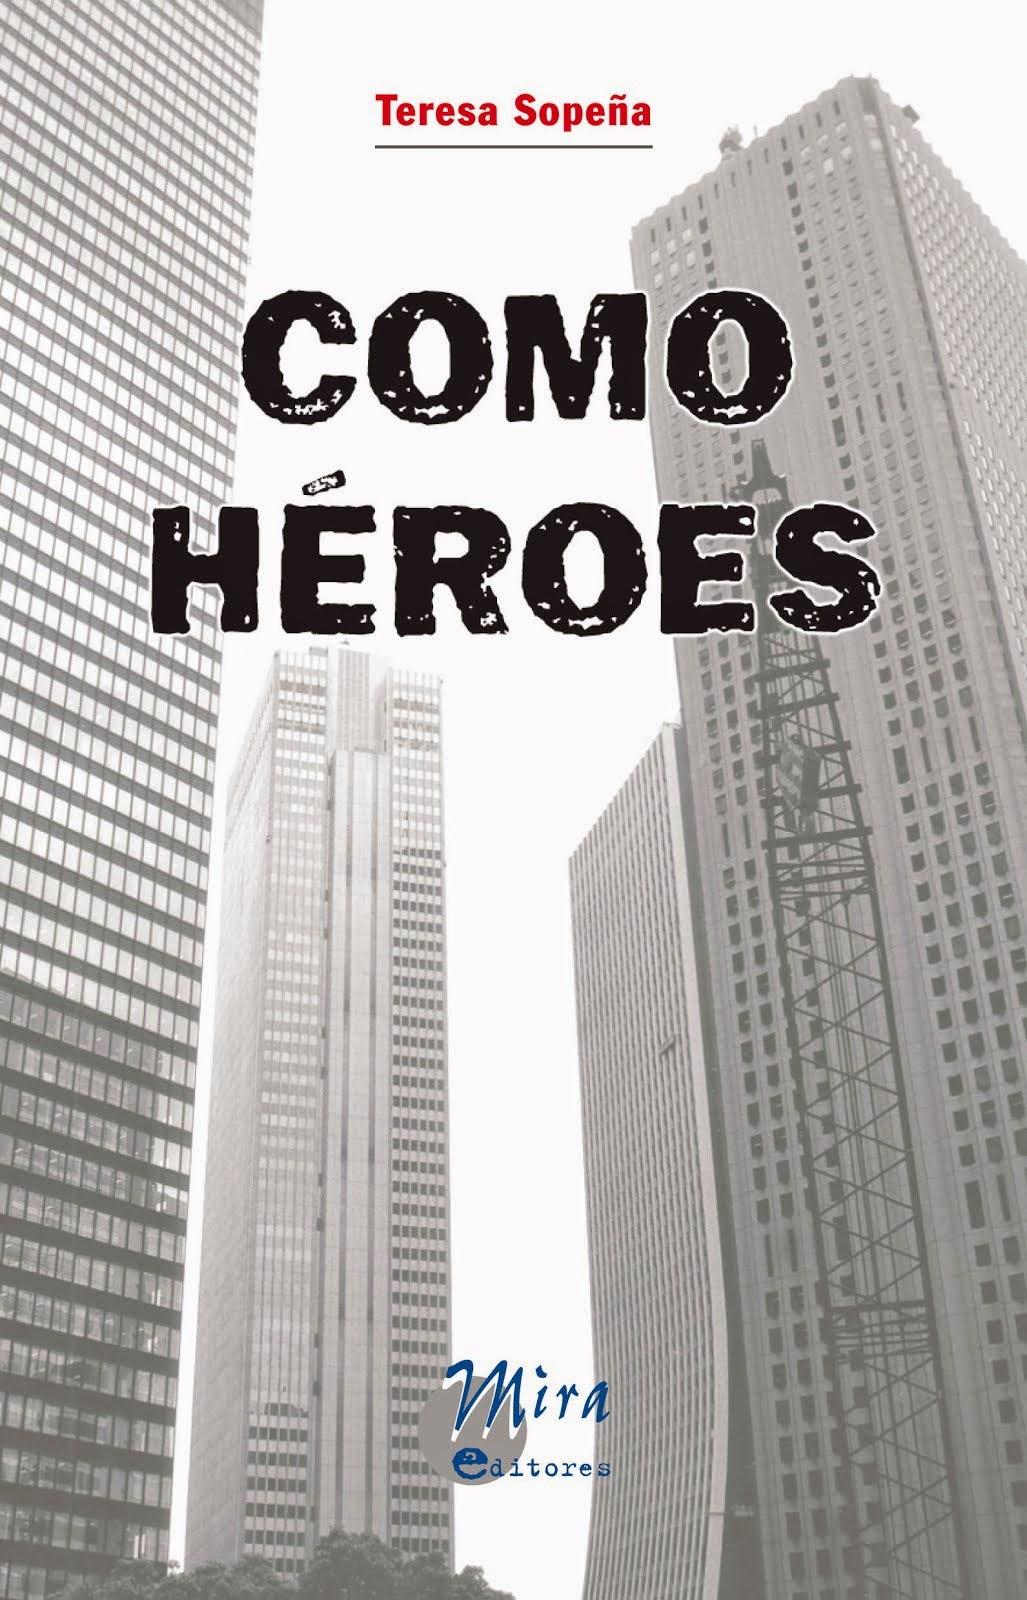 Mira Editores, 2008